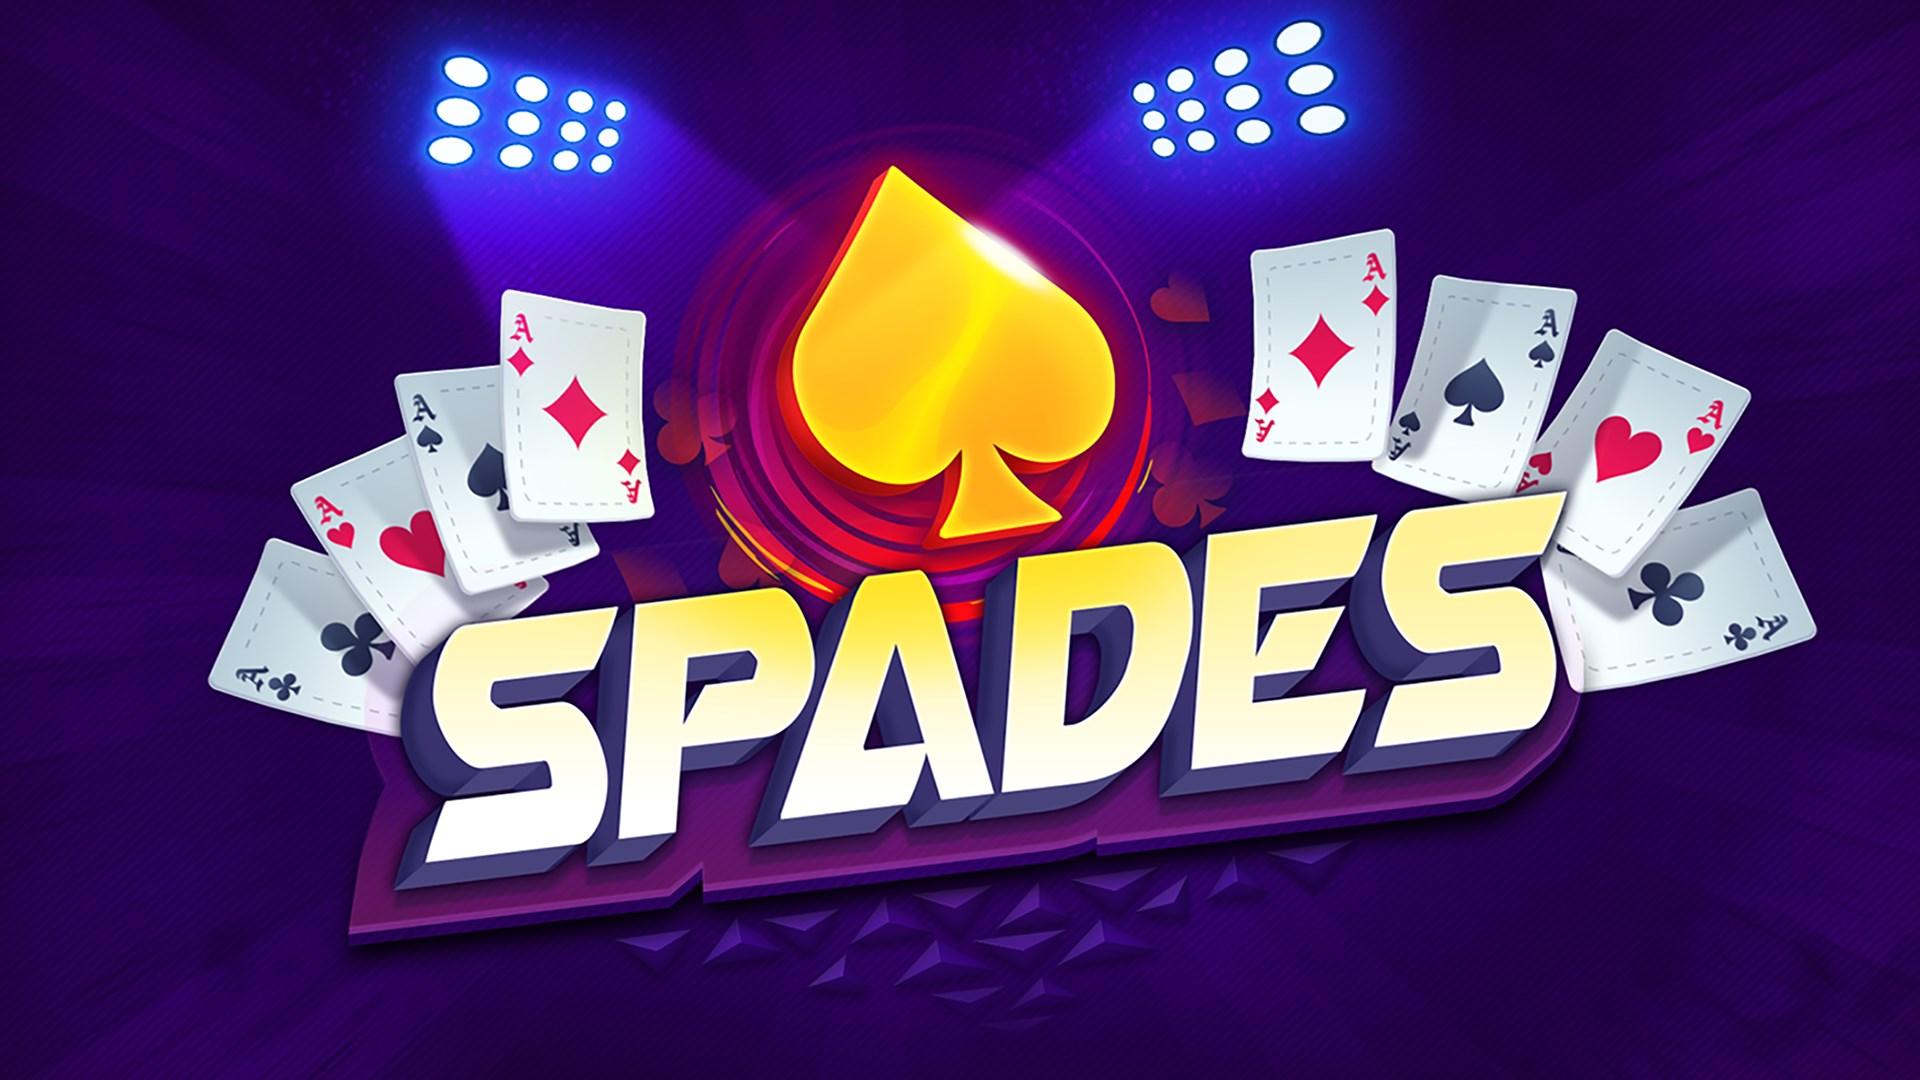 spade card free game  الحصول على Spades Card Game Free - Microsoft Store في ar-DZ